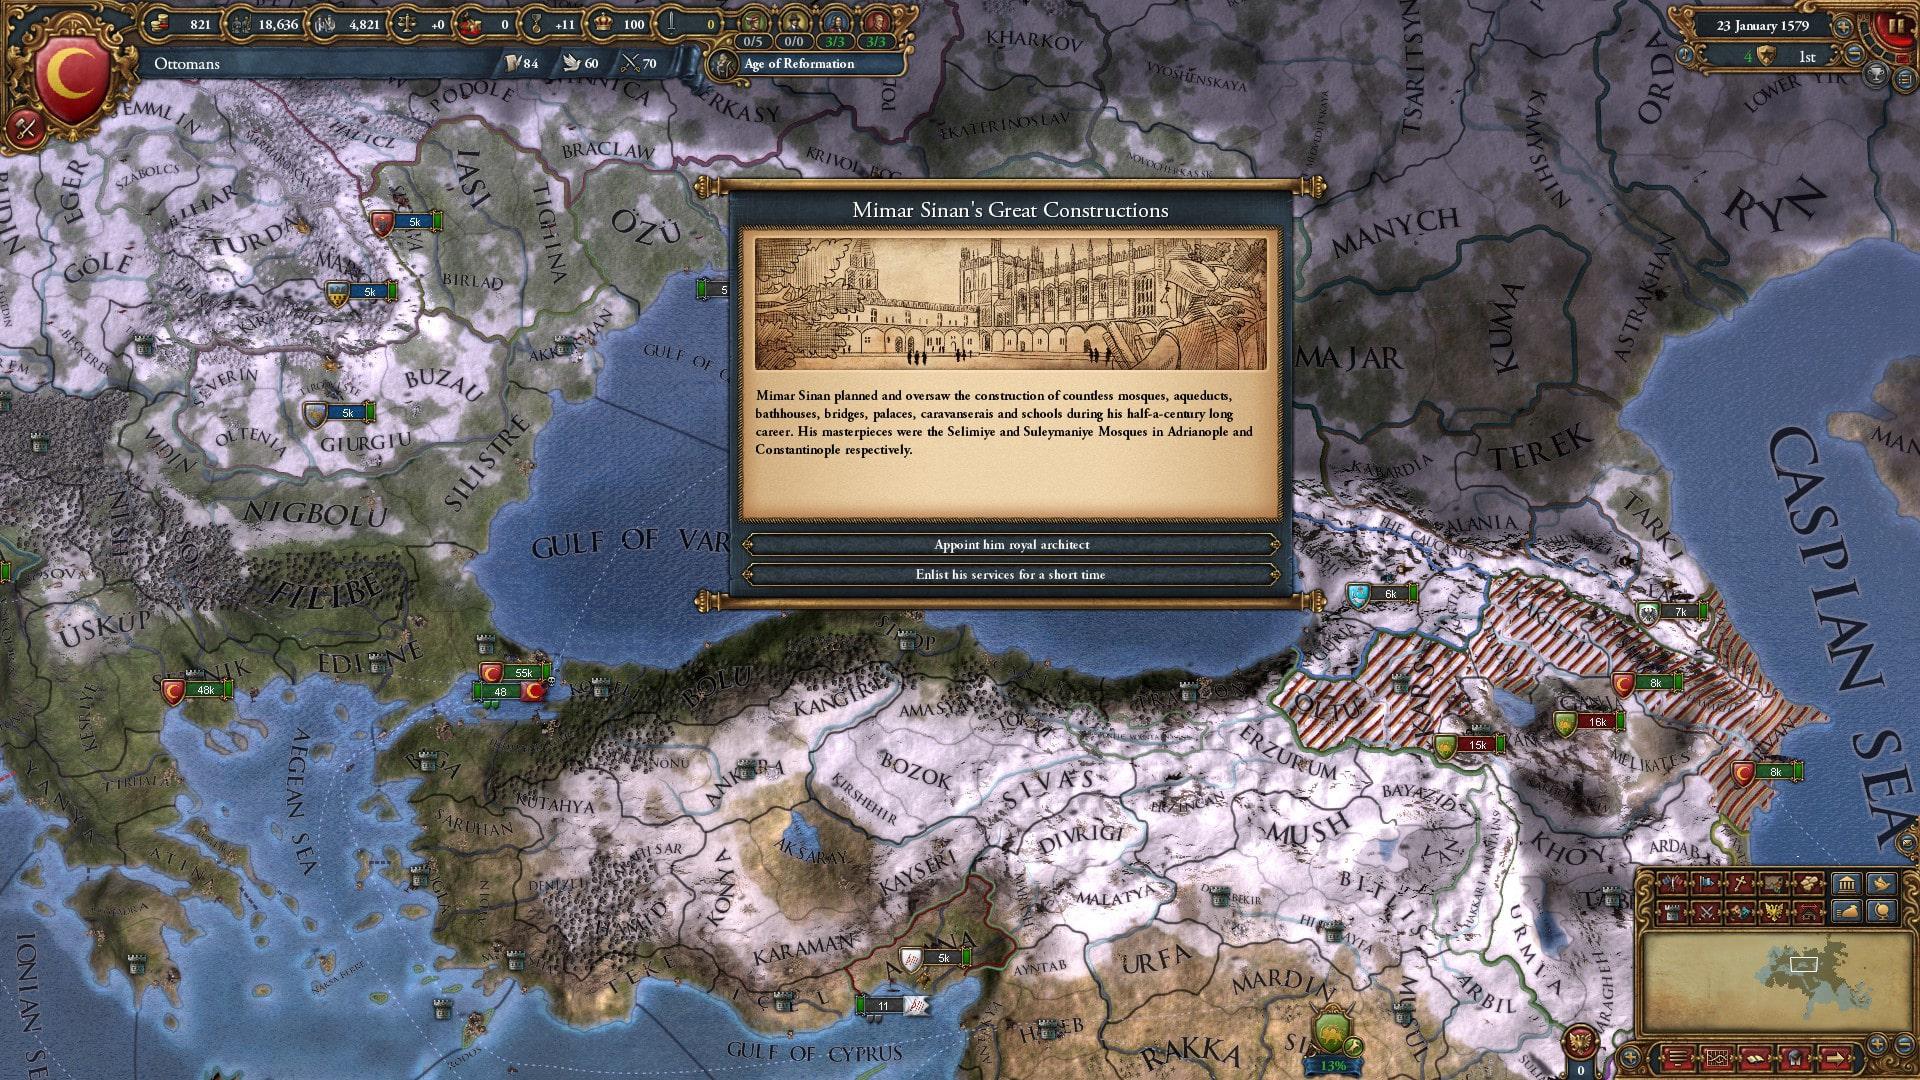 Europa Universalis 4 matchmaking